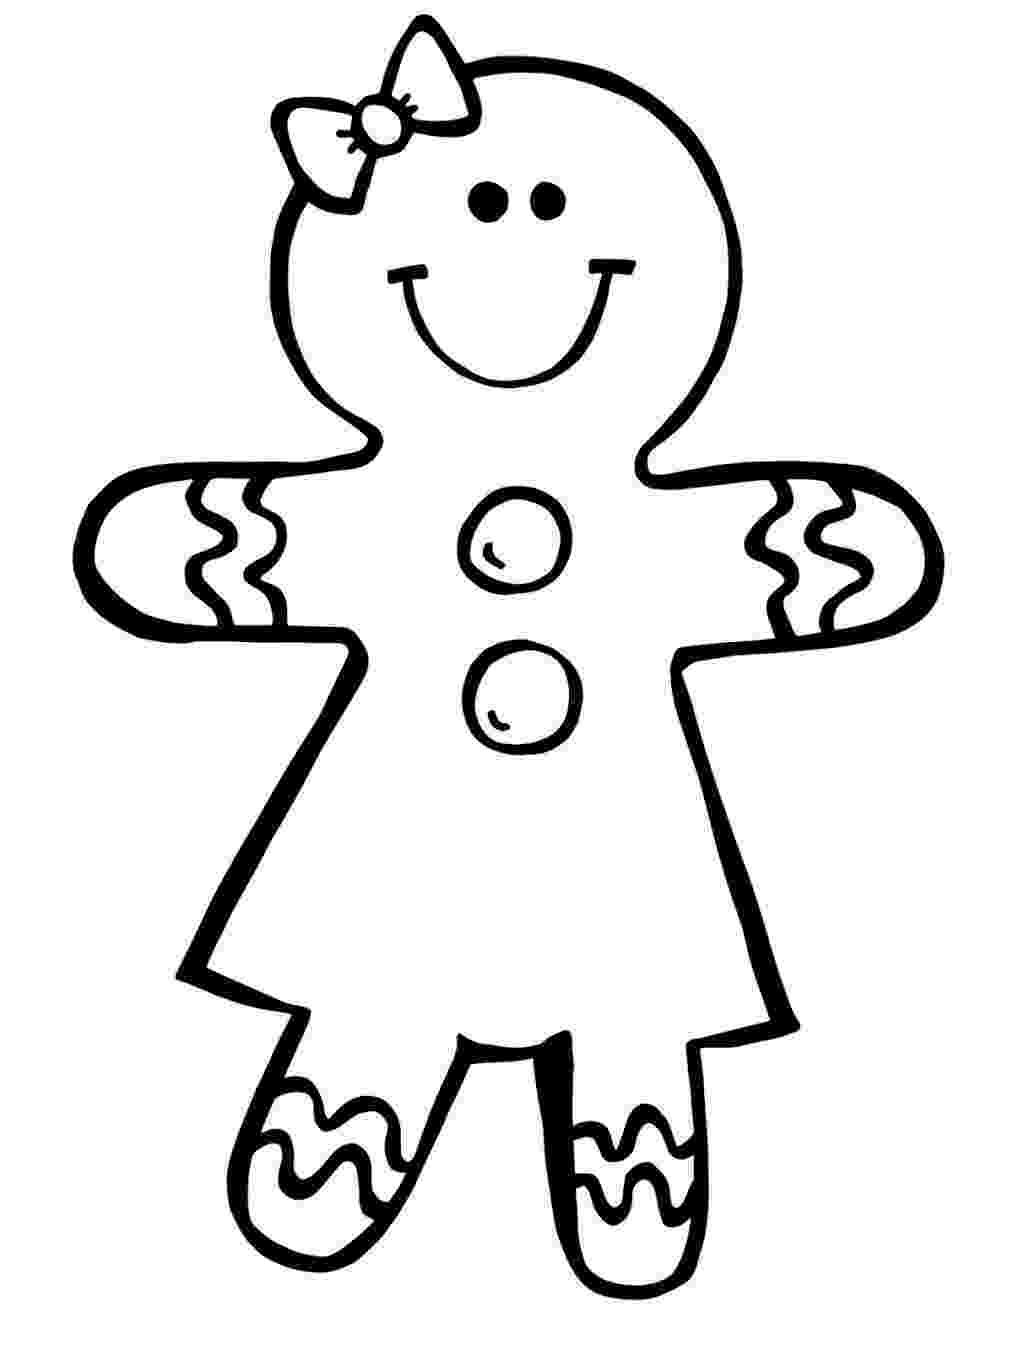 gingerbread man color sheet gingerbread girl coloring pages gingerbread man coloring color sheet man gingerbread